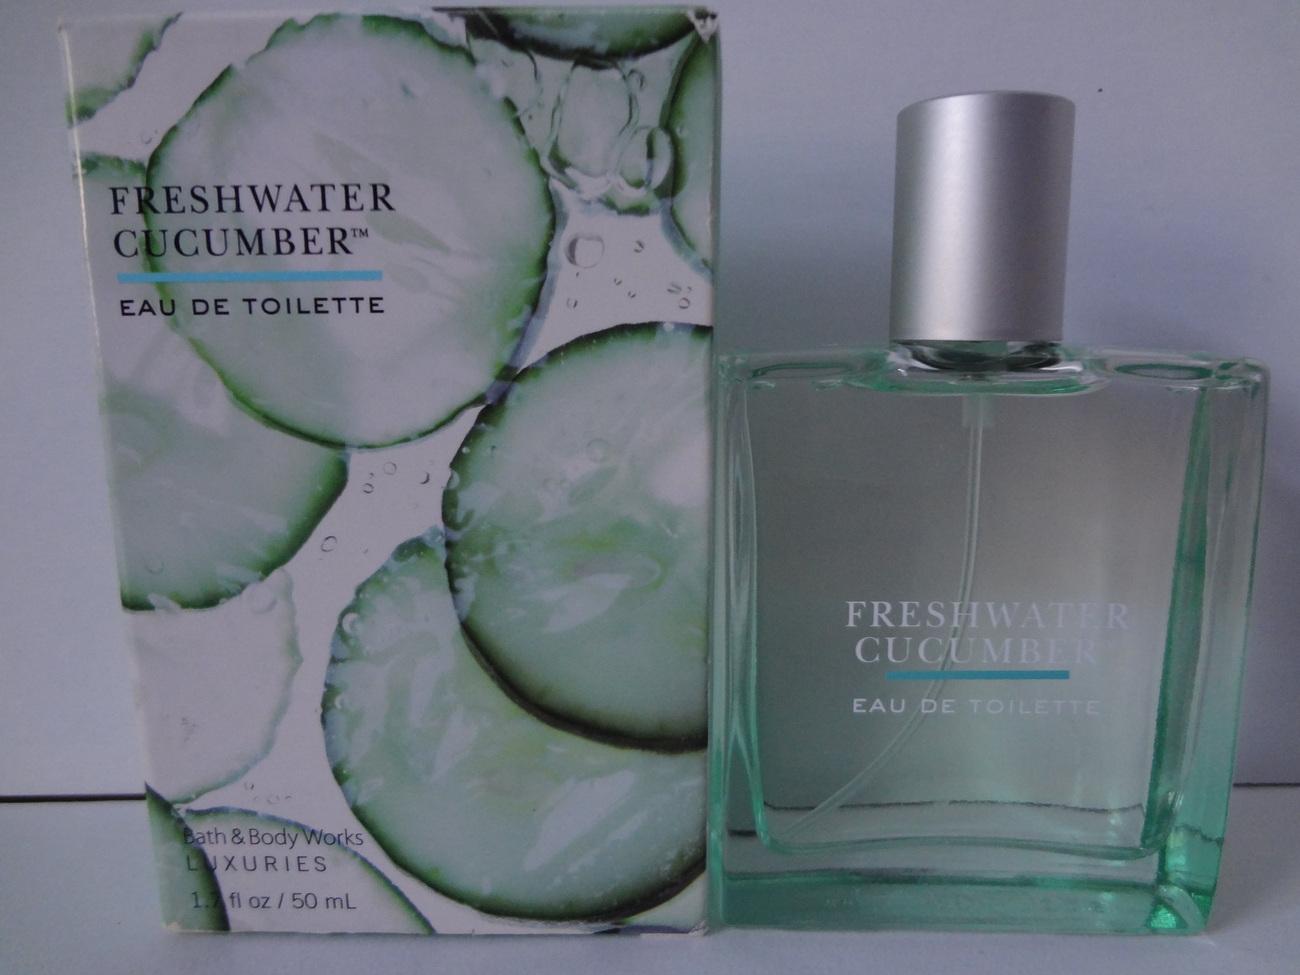 Bath & Body Works Luxuries Freshwater Cucumber Eau De Toilette 1.7 fl oz / 50 ml